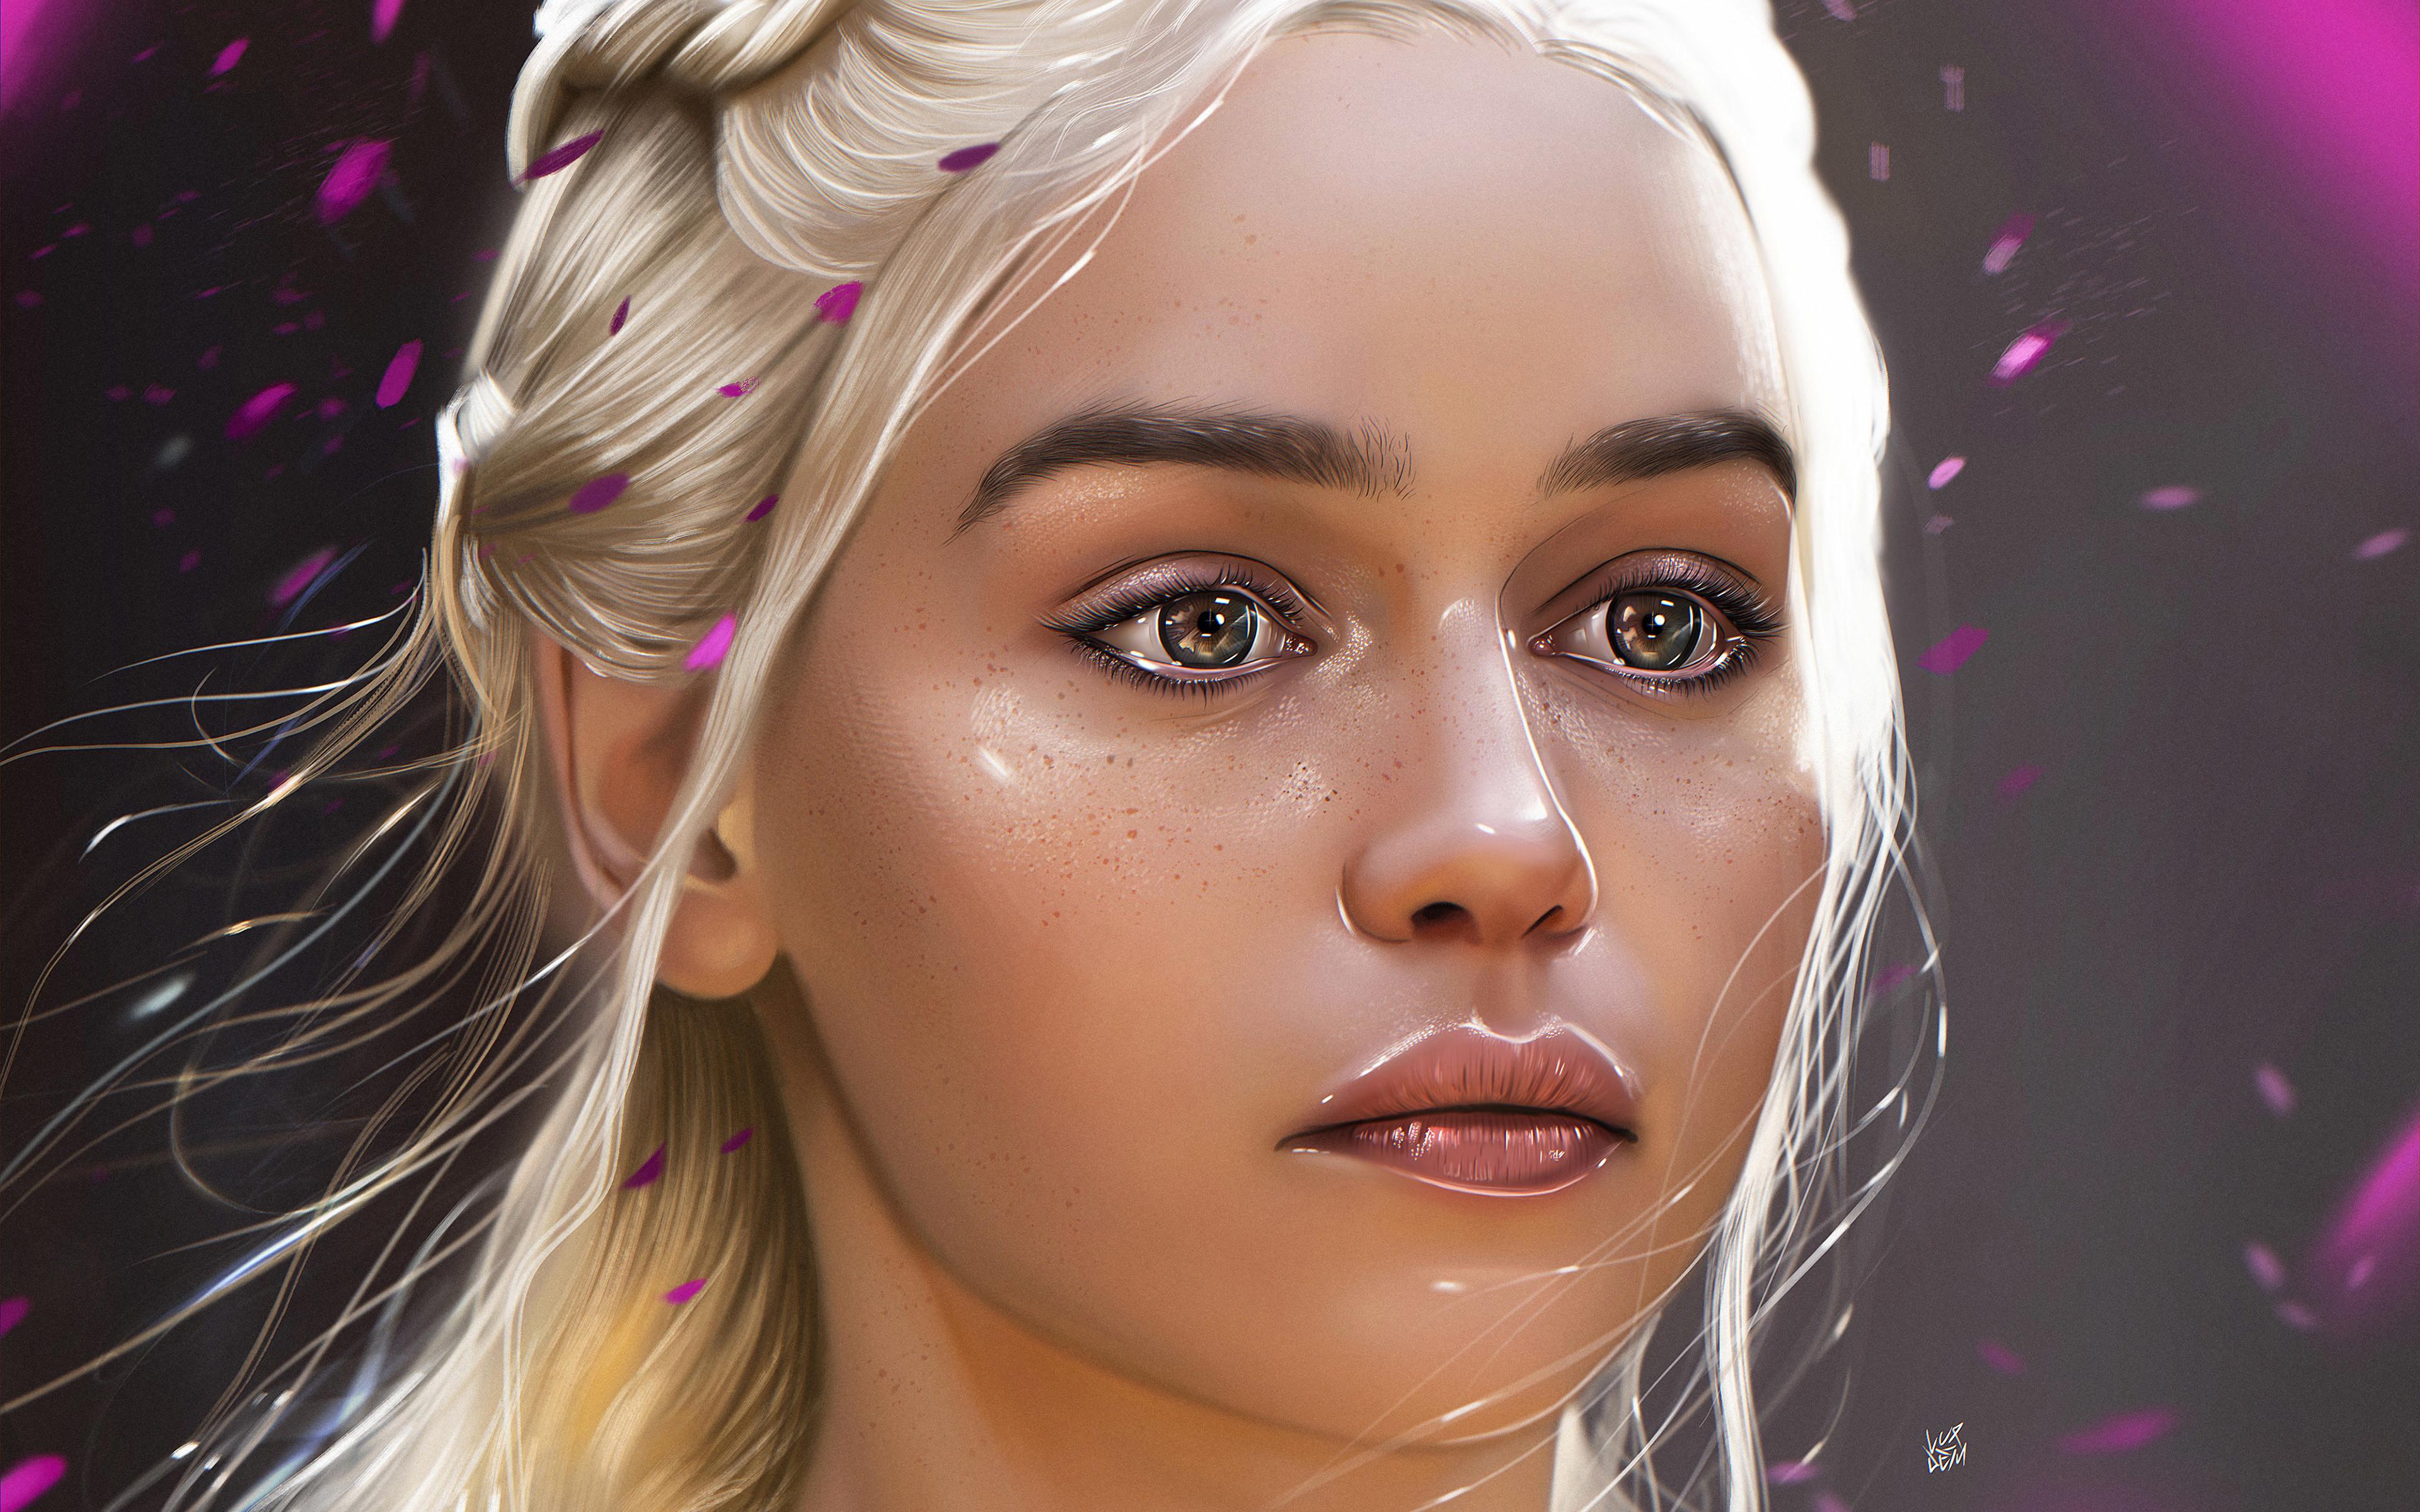 Fondos de pantalla Daenerys Targaryen Fan-art